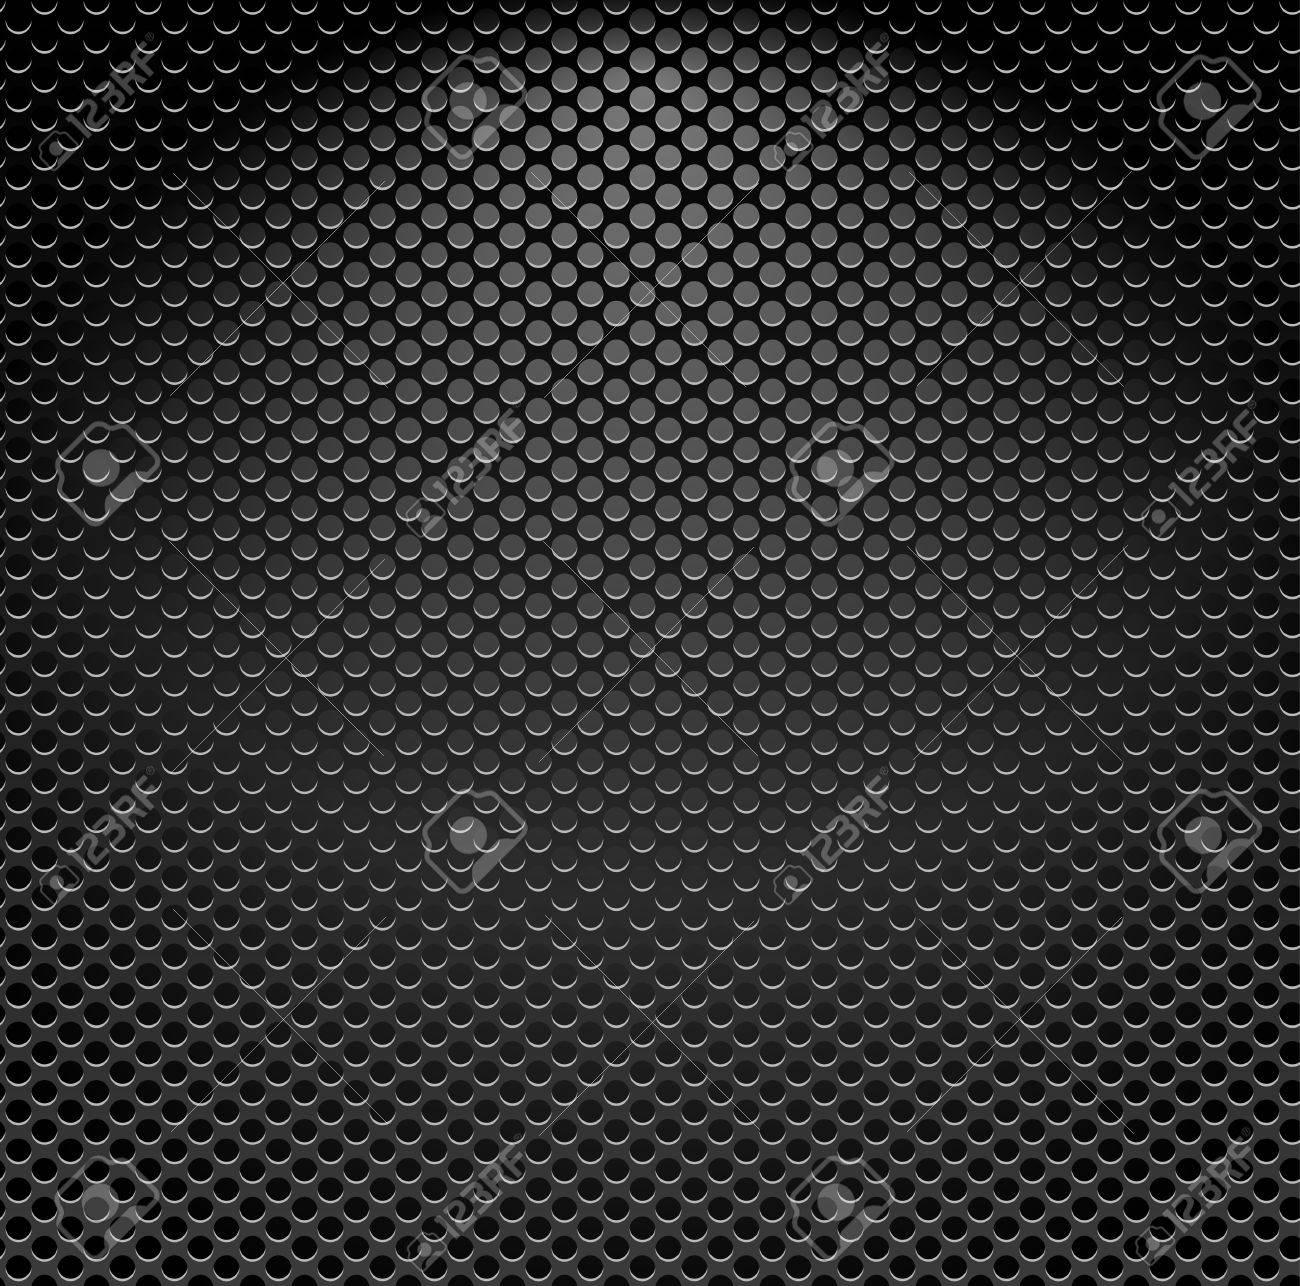 Metallic textured background - seamless pattern Stock Vector - 15991962